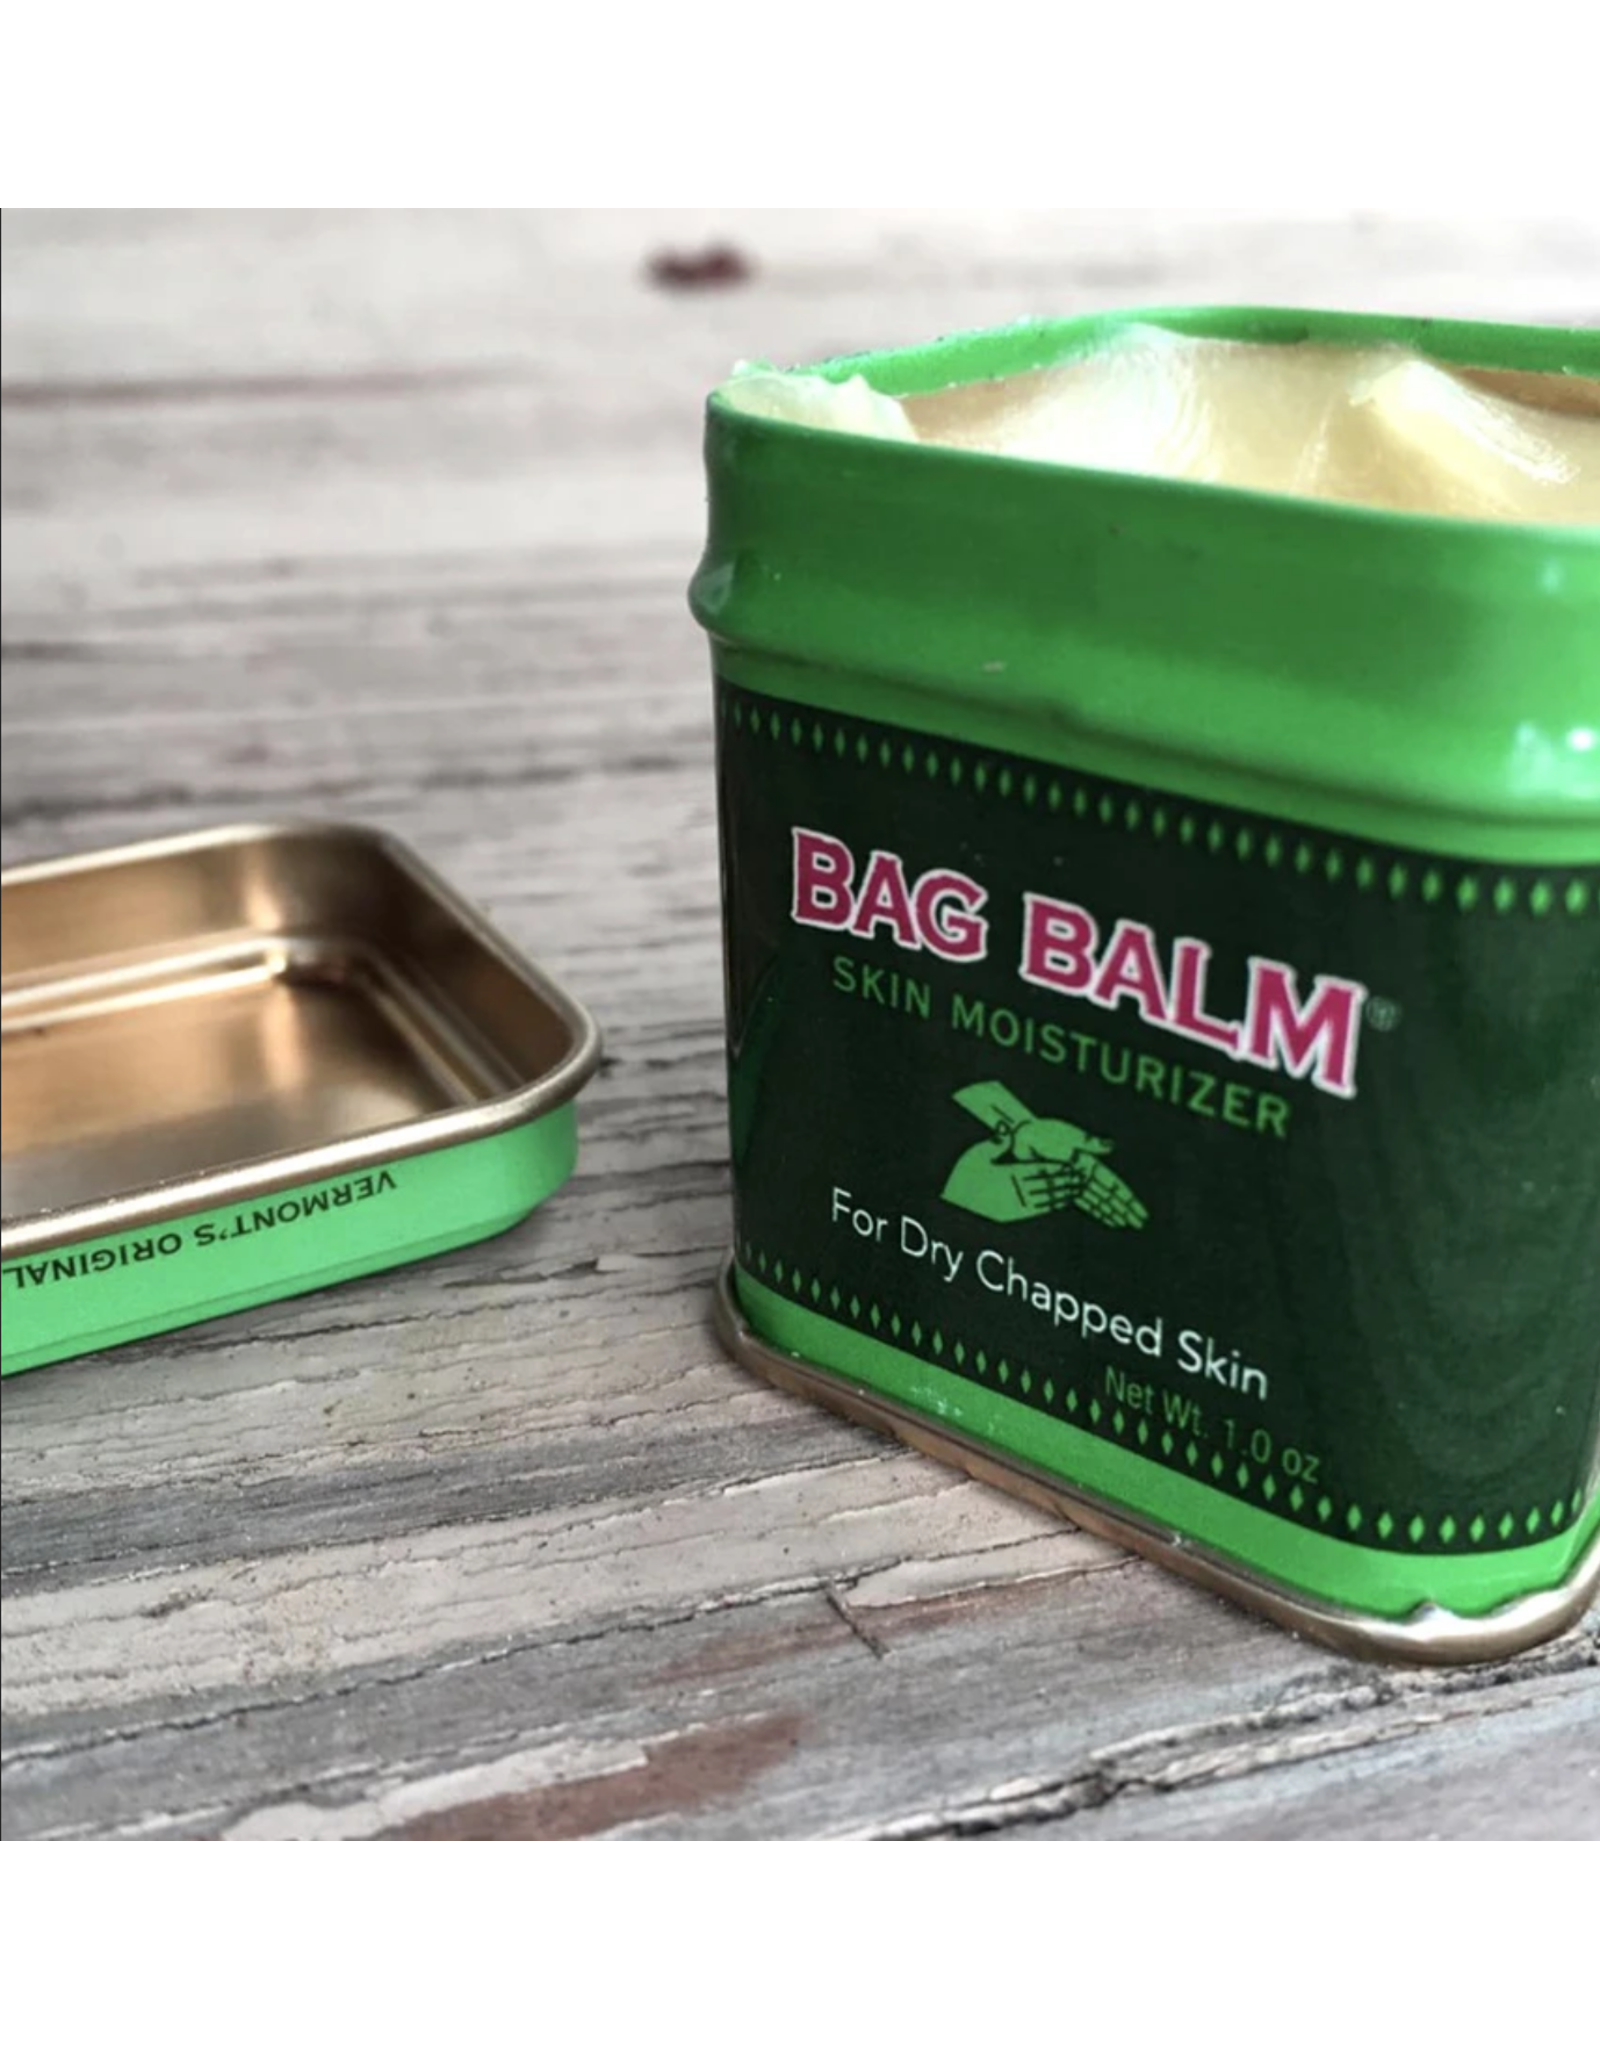 Vermont's Original Bag Balm